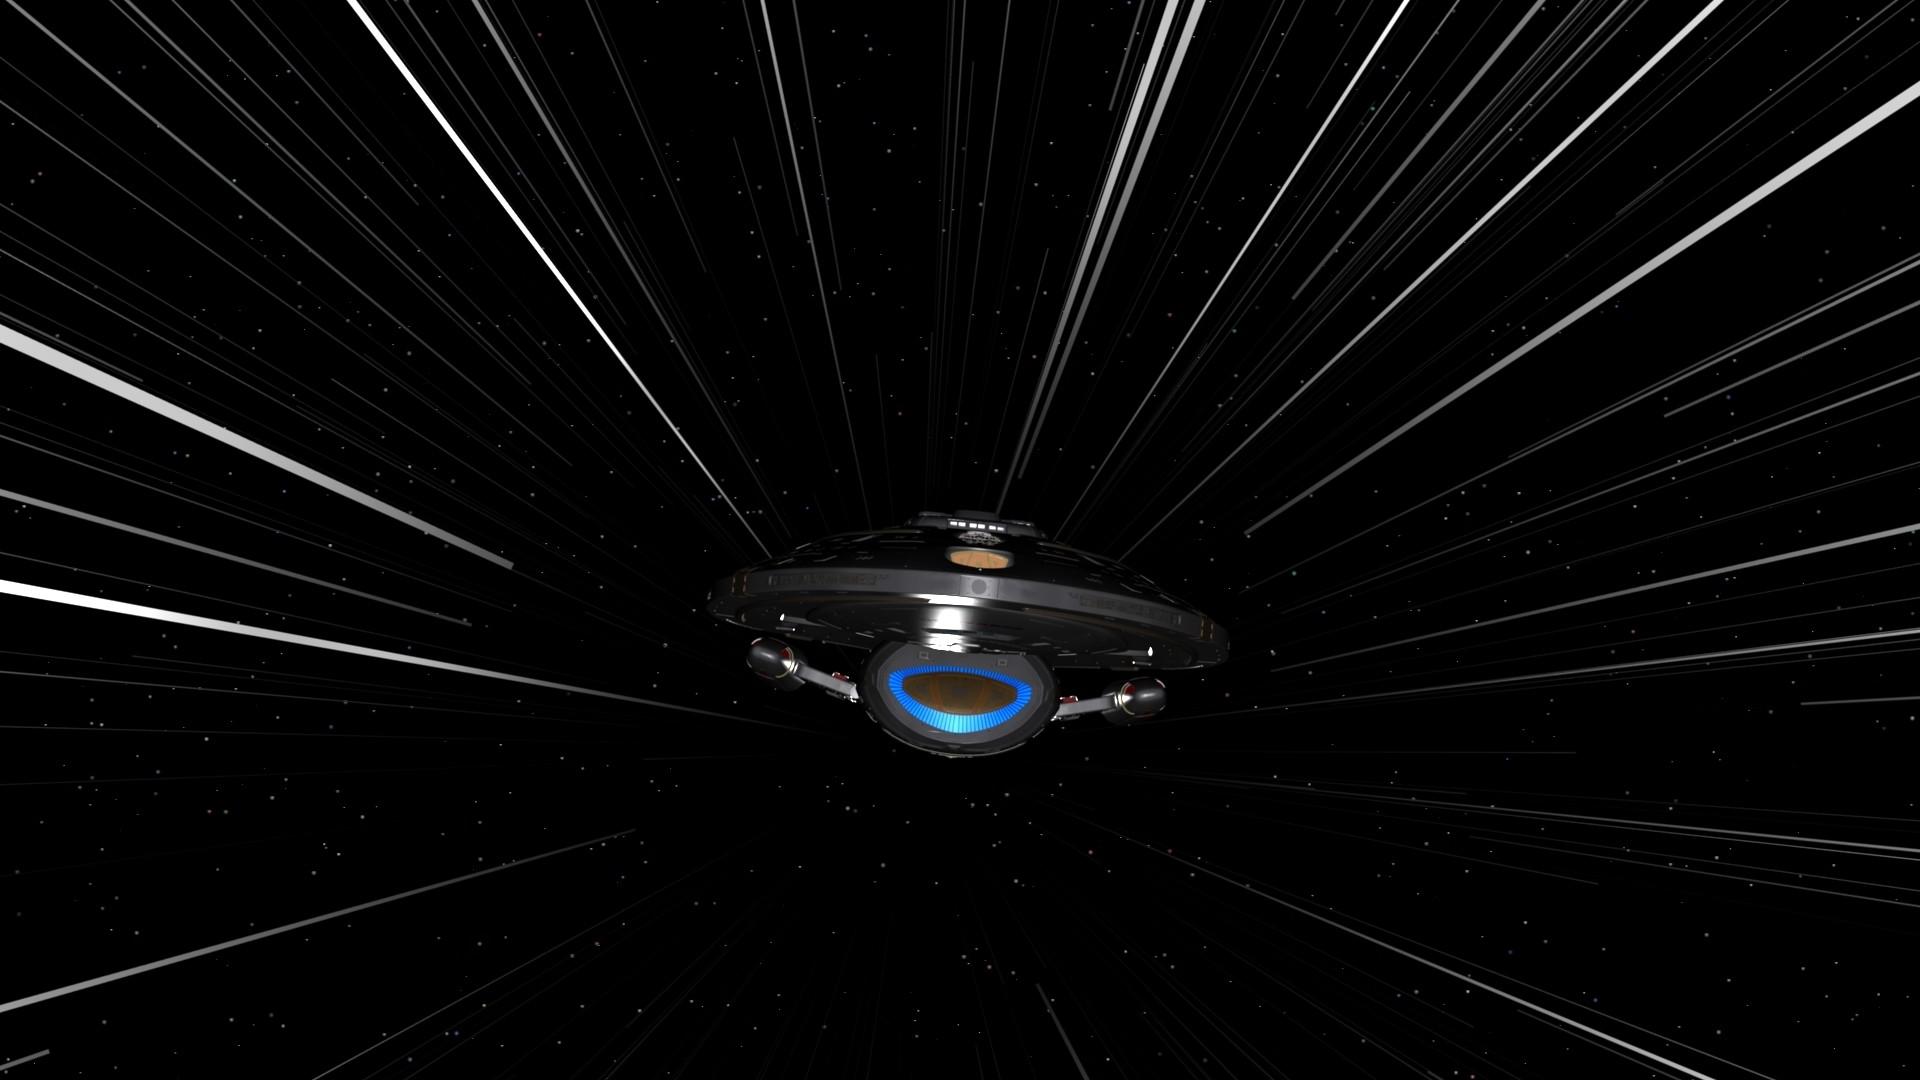 Star Trek Ship Into Warp – Star Trek into Darkness HD Wallpapers for  Windows 8